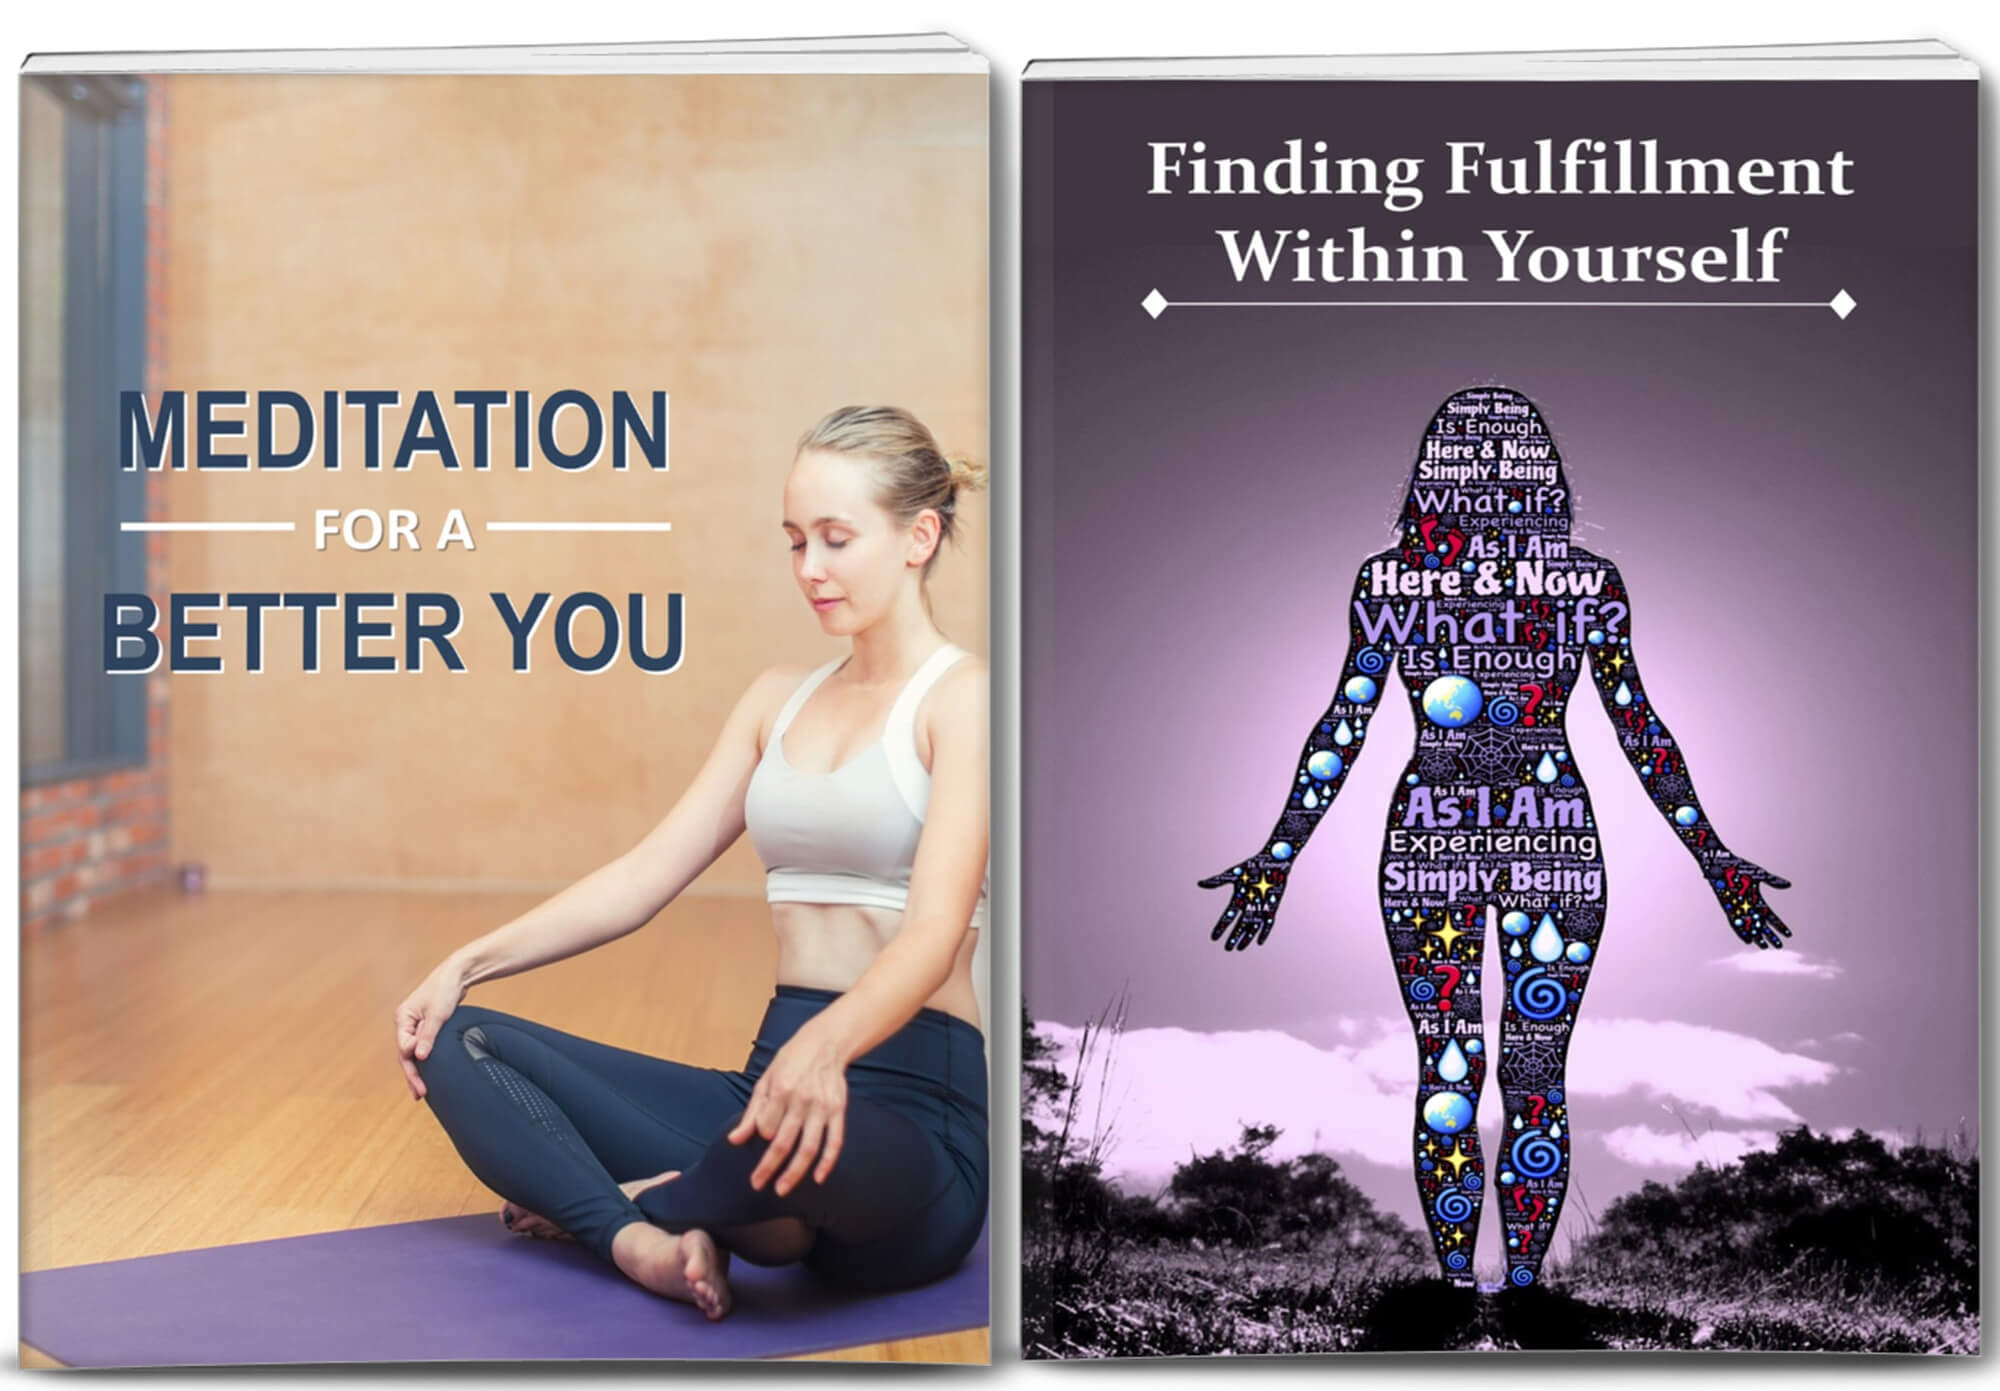 fulfillment and meditation plr